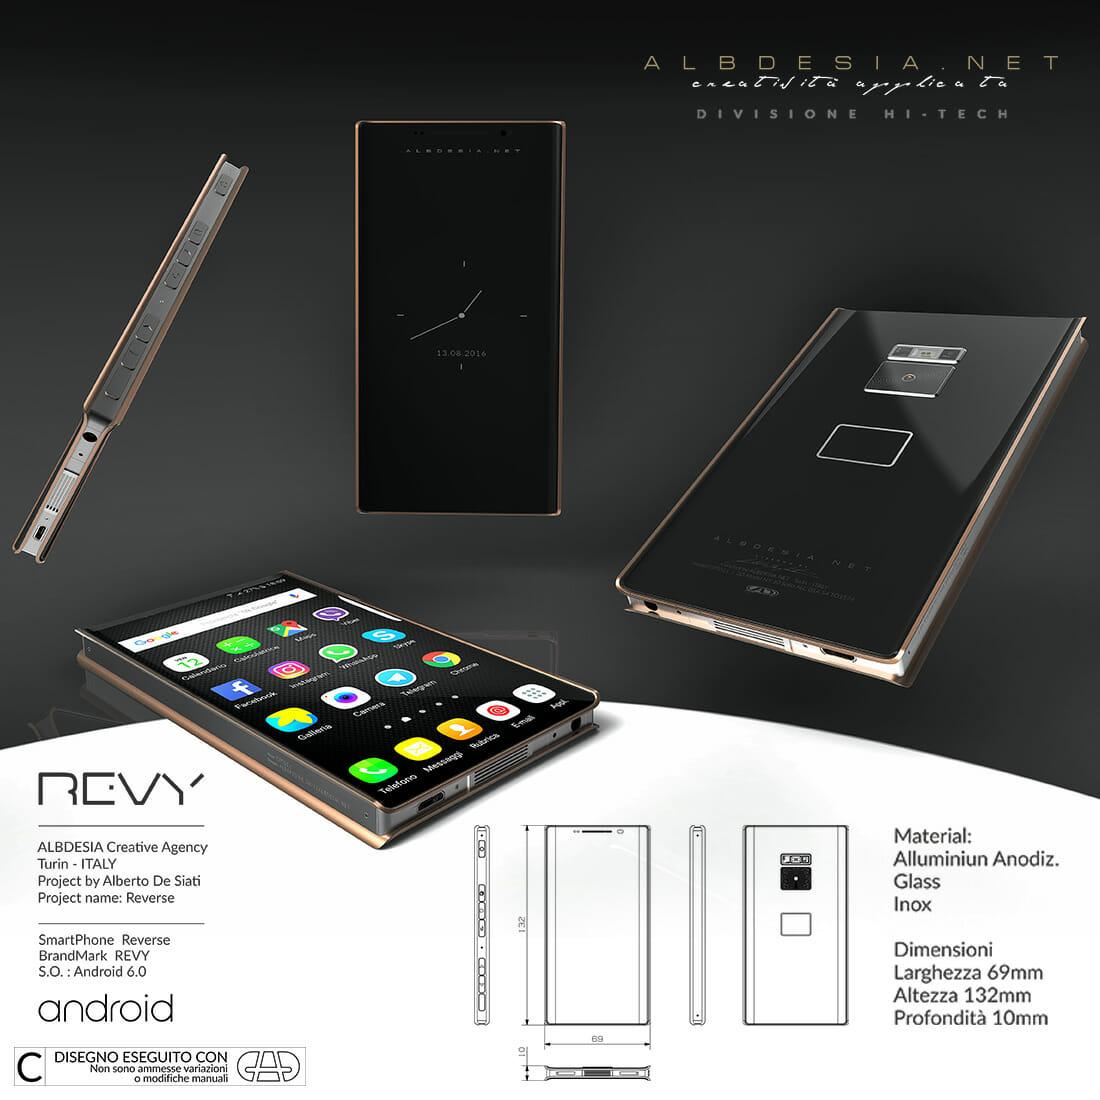 REVY Smartphone Designer Alberto De Siati